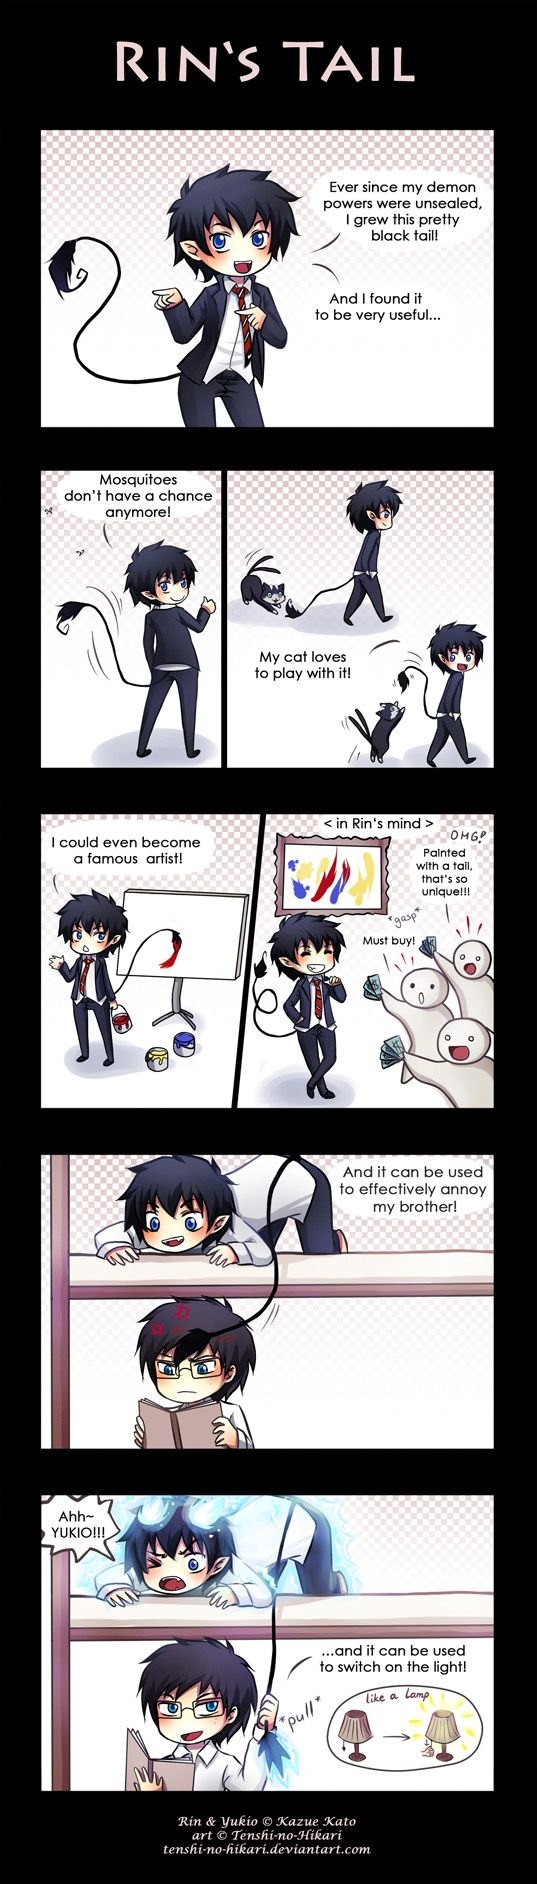 Anime/manga: Blue Exorcist Characters: Rin and Yukio, seriously dude?